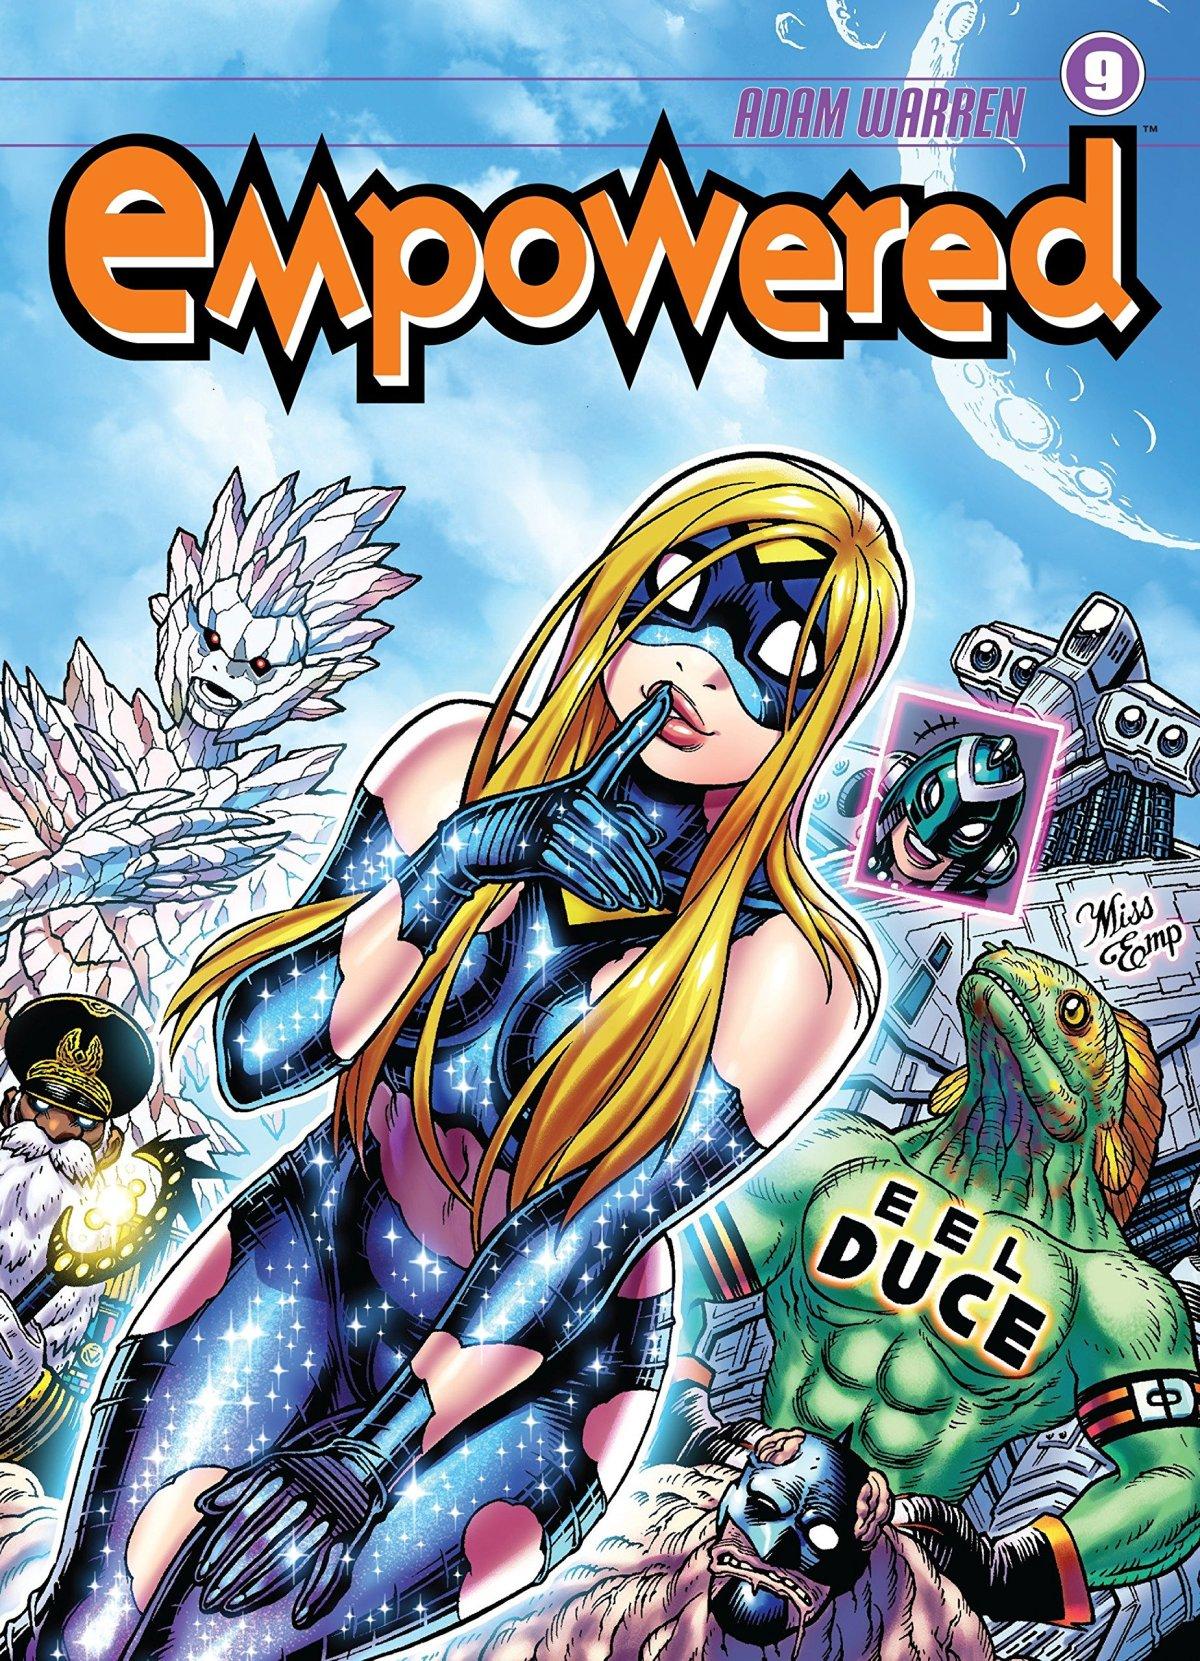 Empowered, deconstructive comics